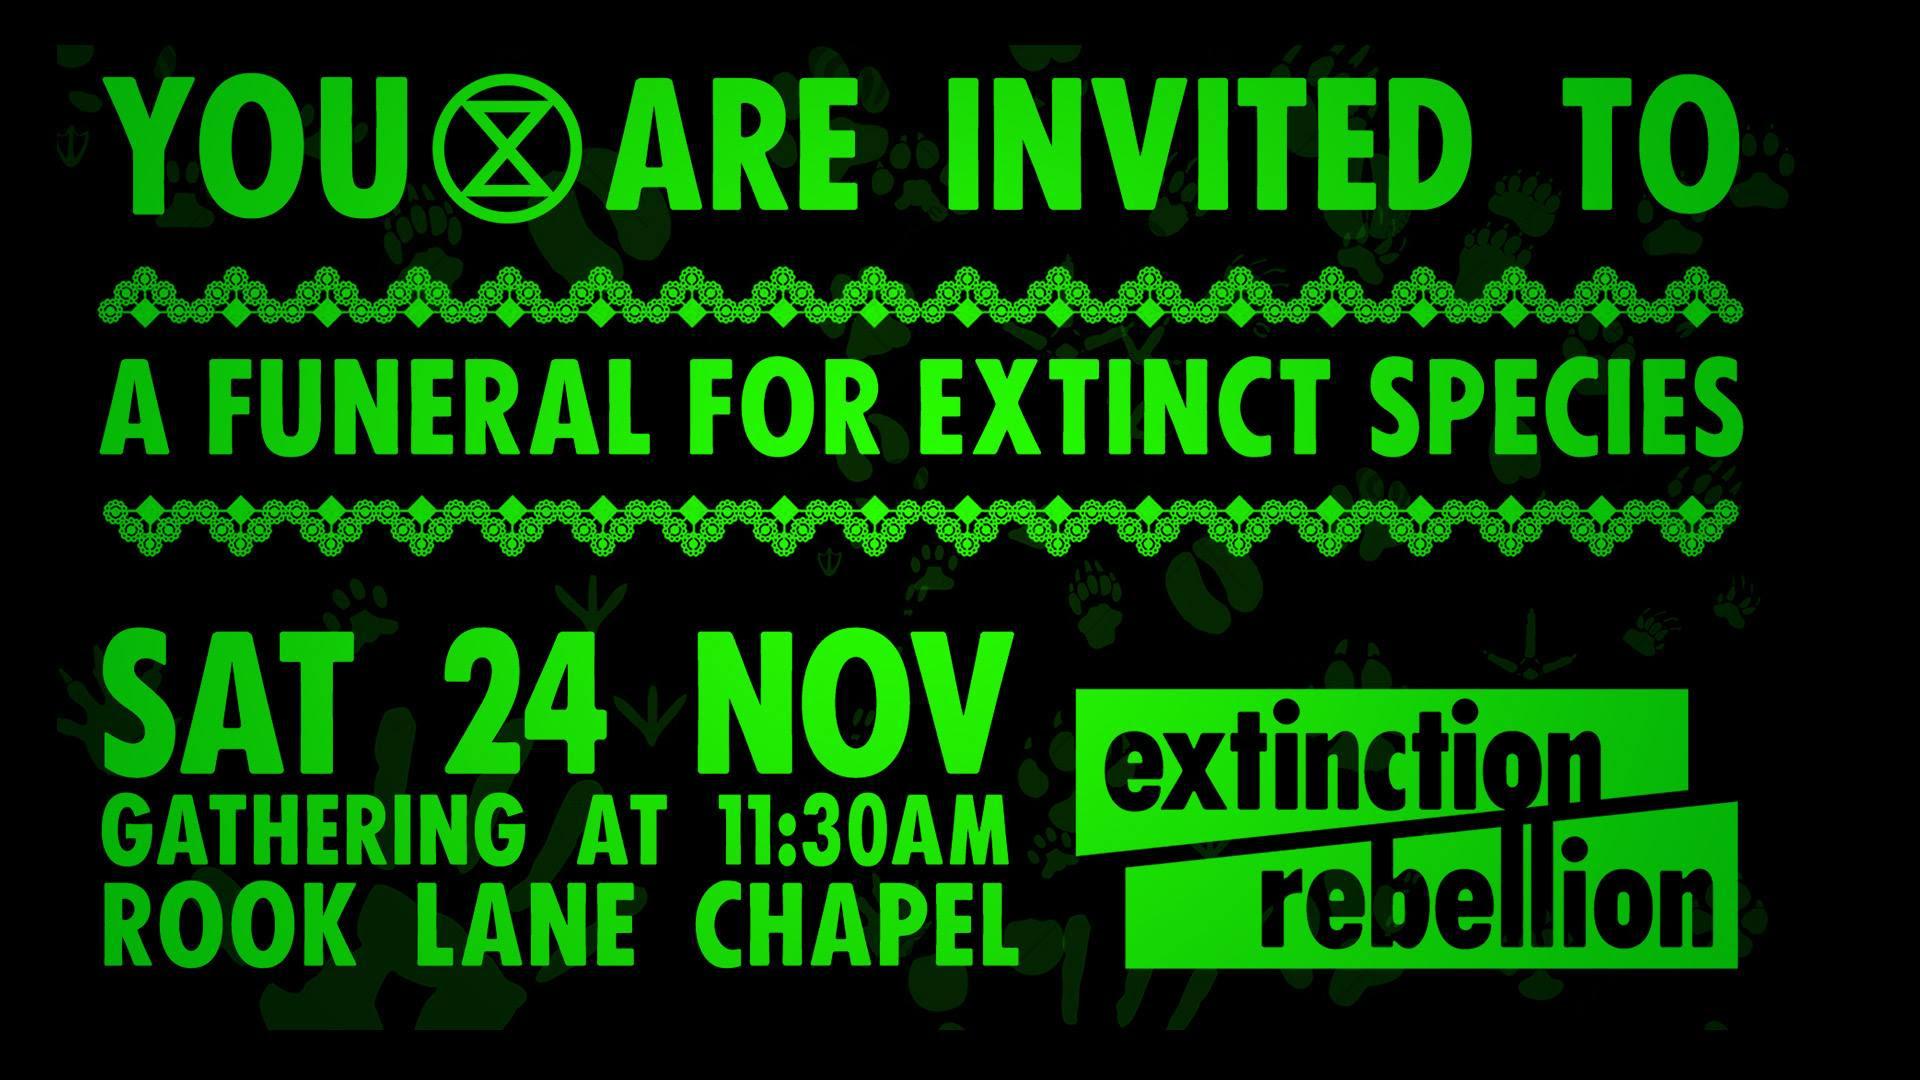 extinction_funeral